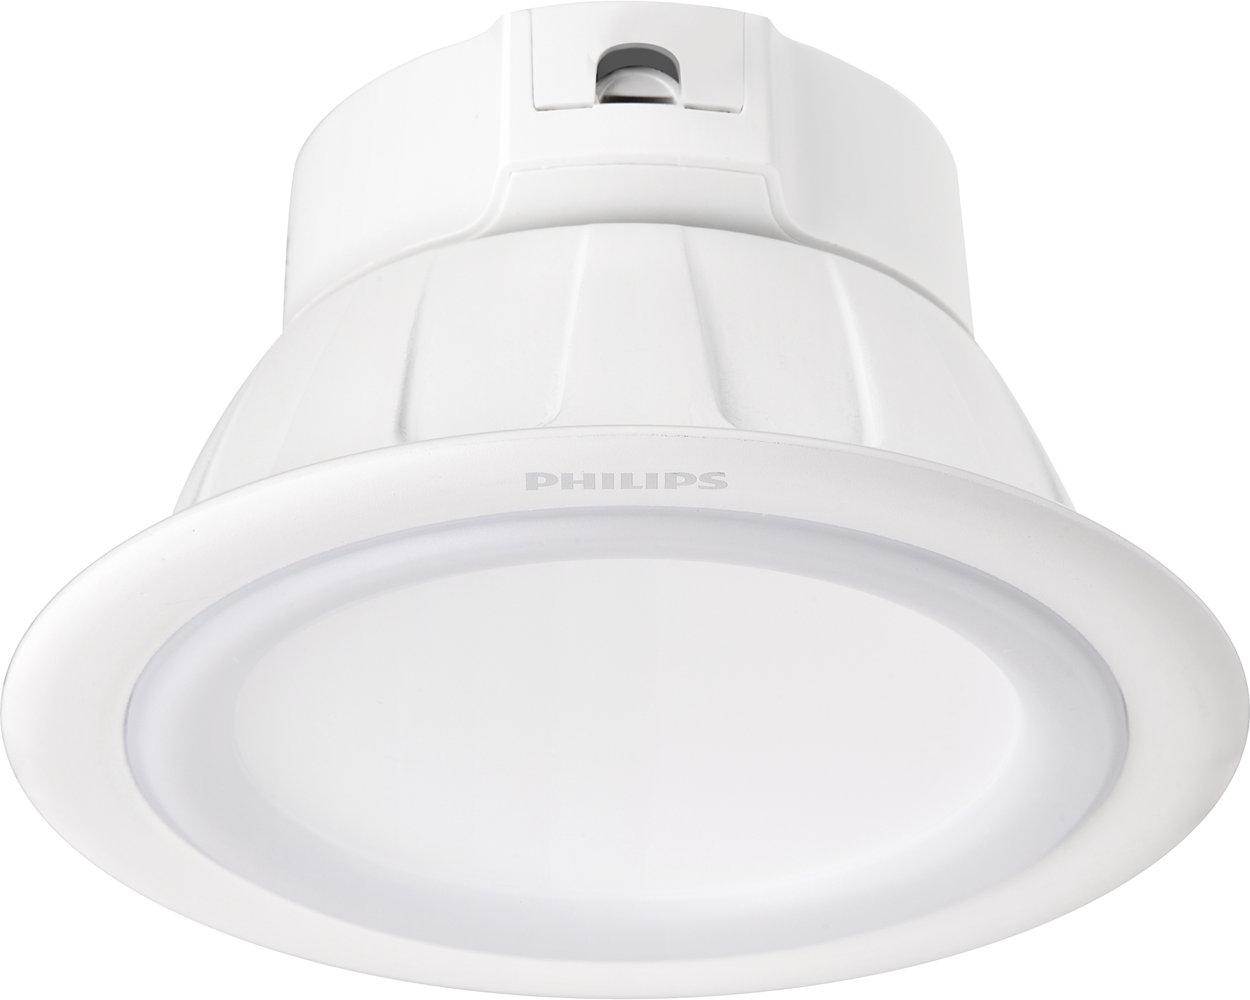 iluminación versátil para un hogar inteligente